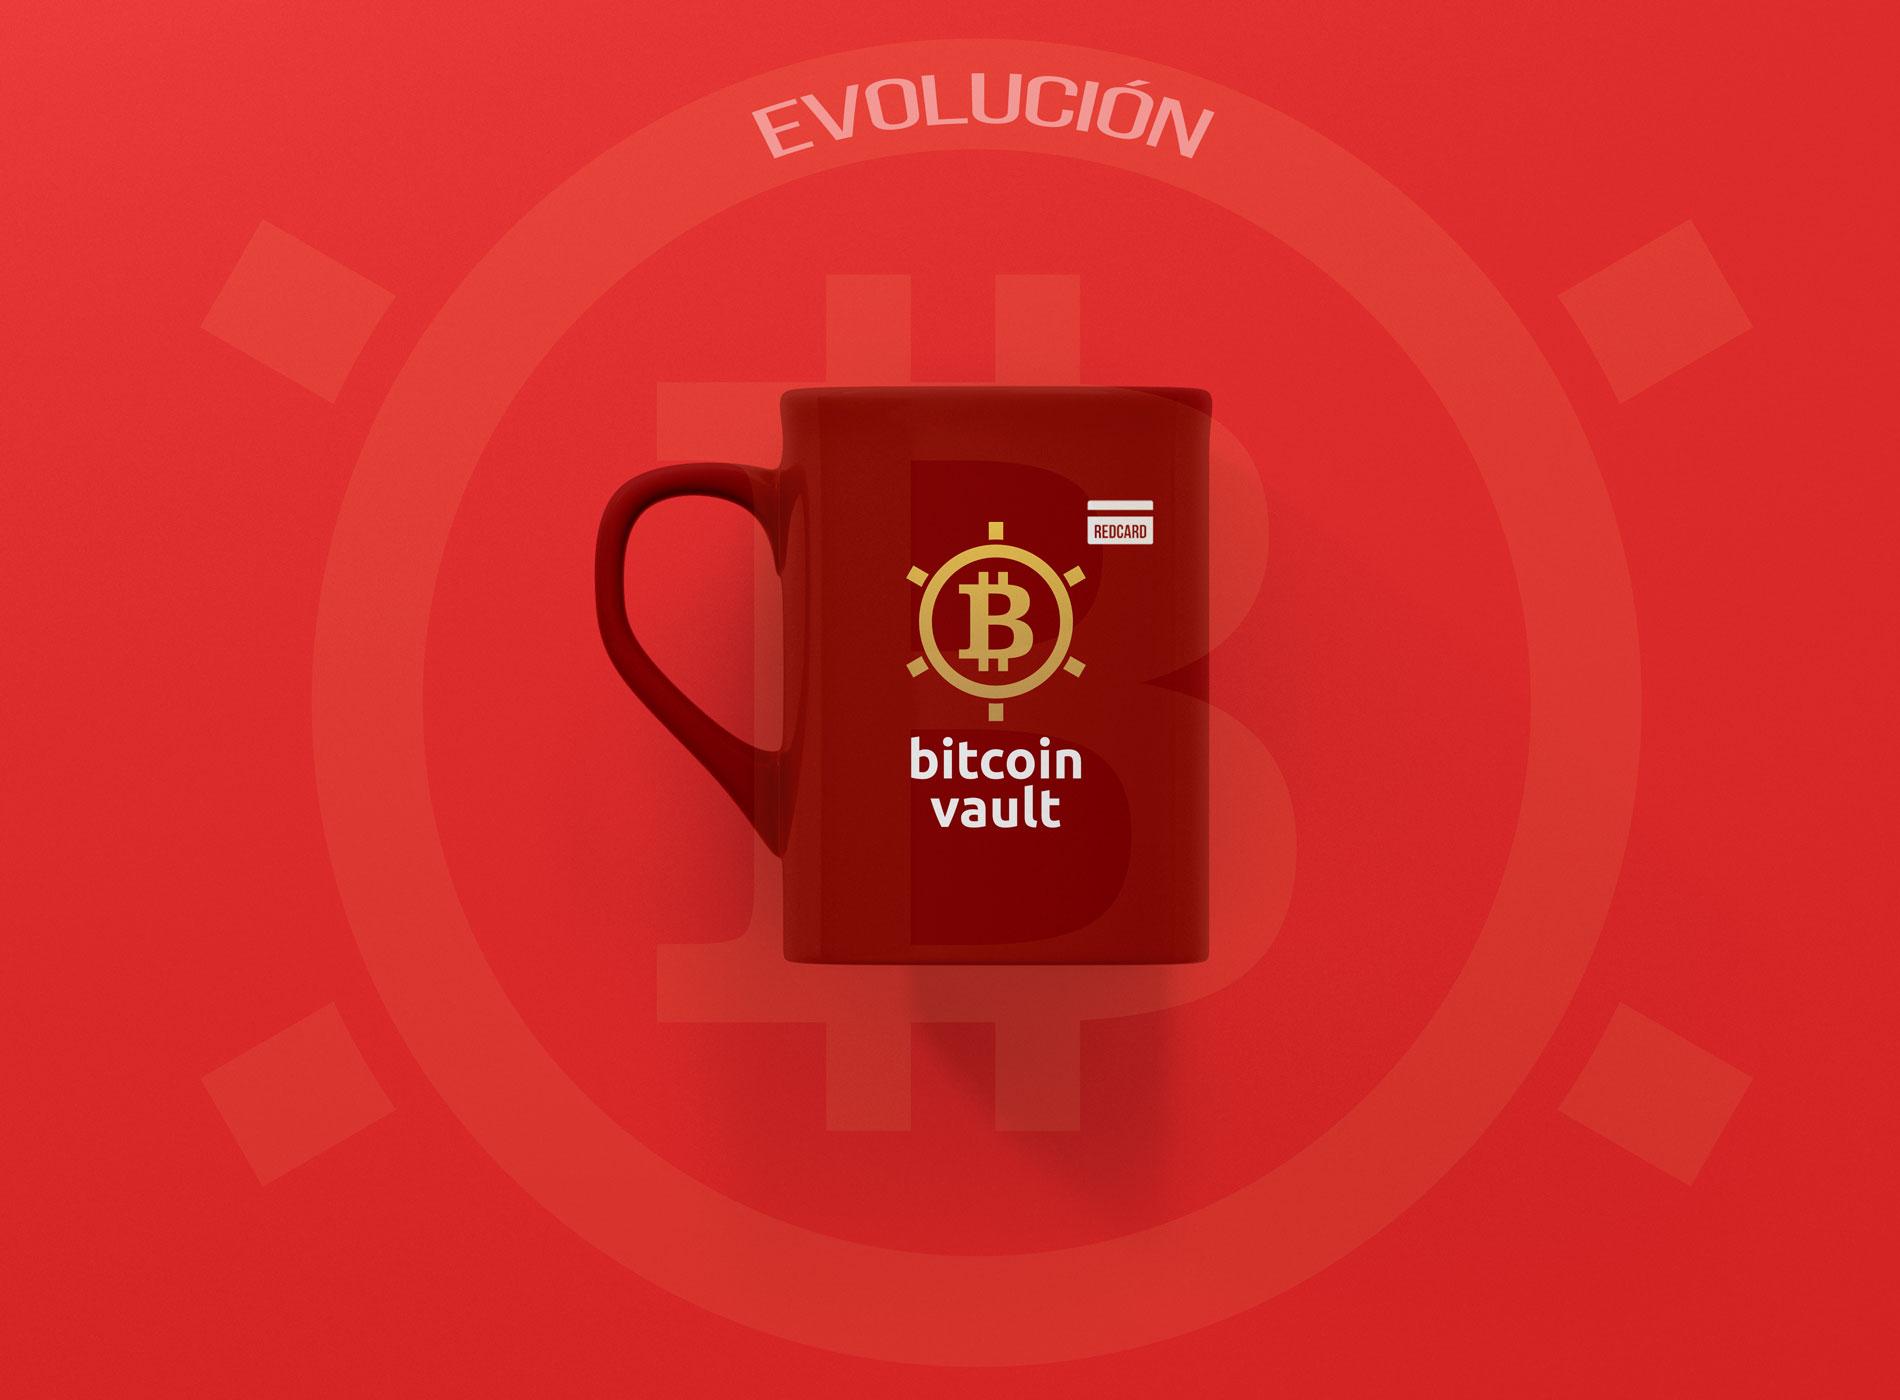 Evolución del bitcoin vault